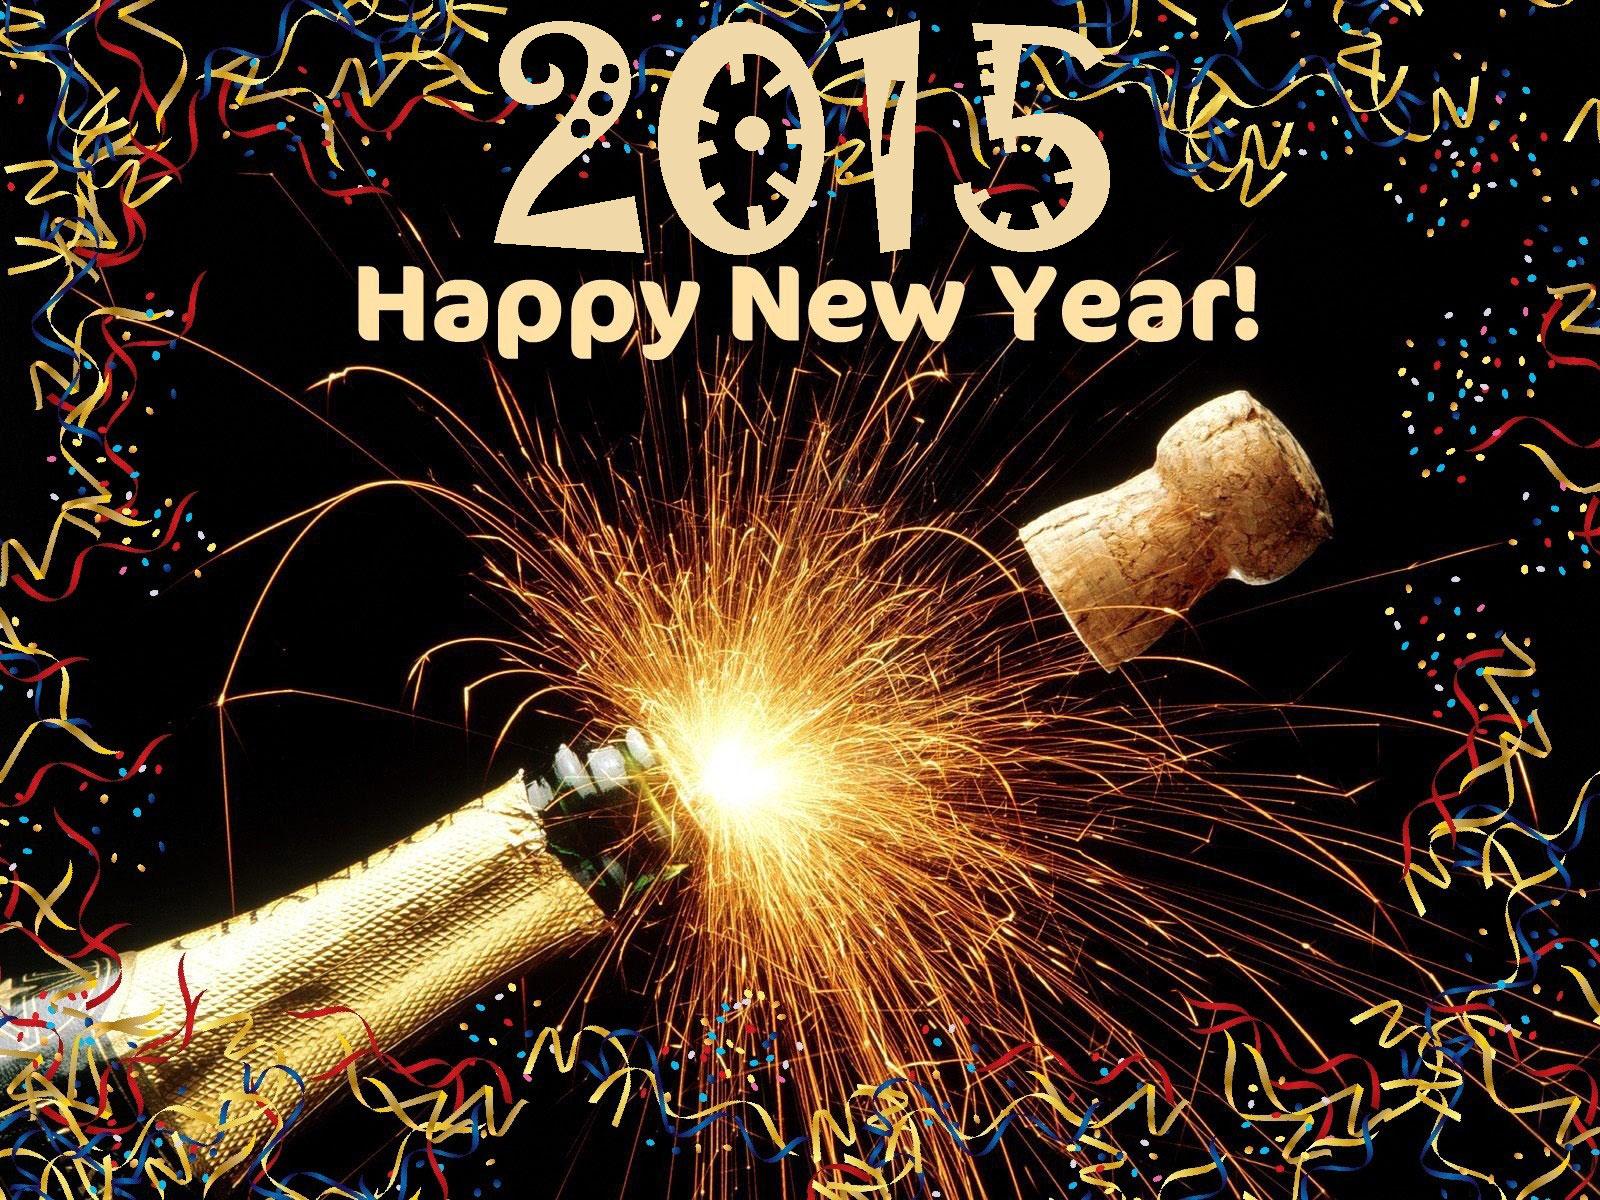 Happy New Year 2015 Wallpaper 3d 16   Engledow Group 1600x1200